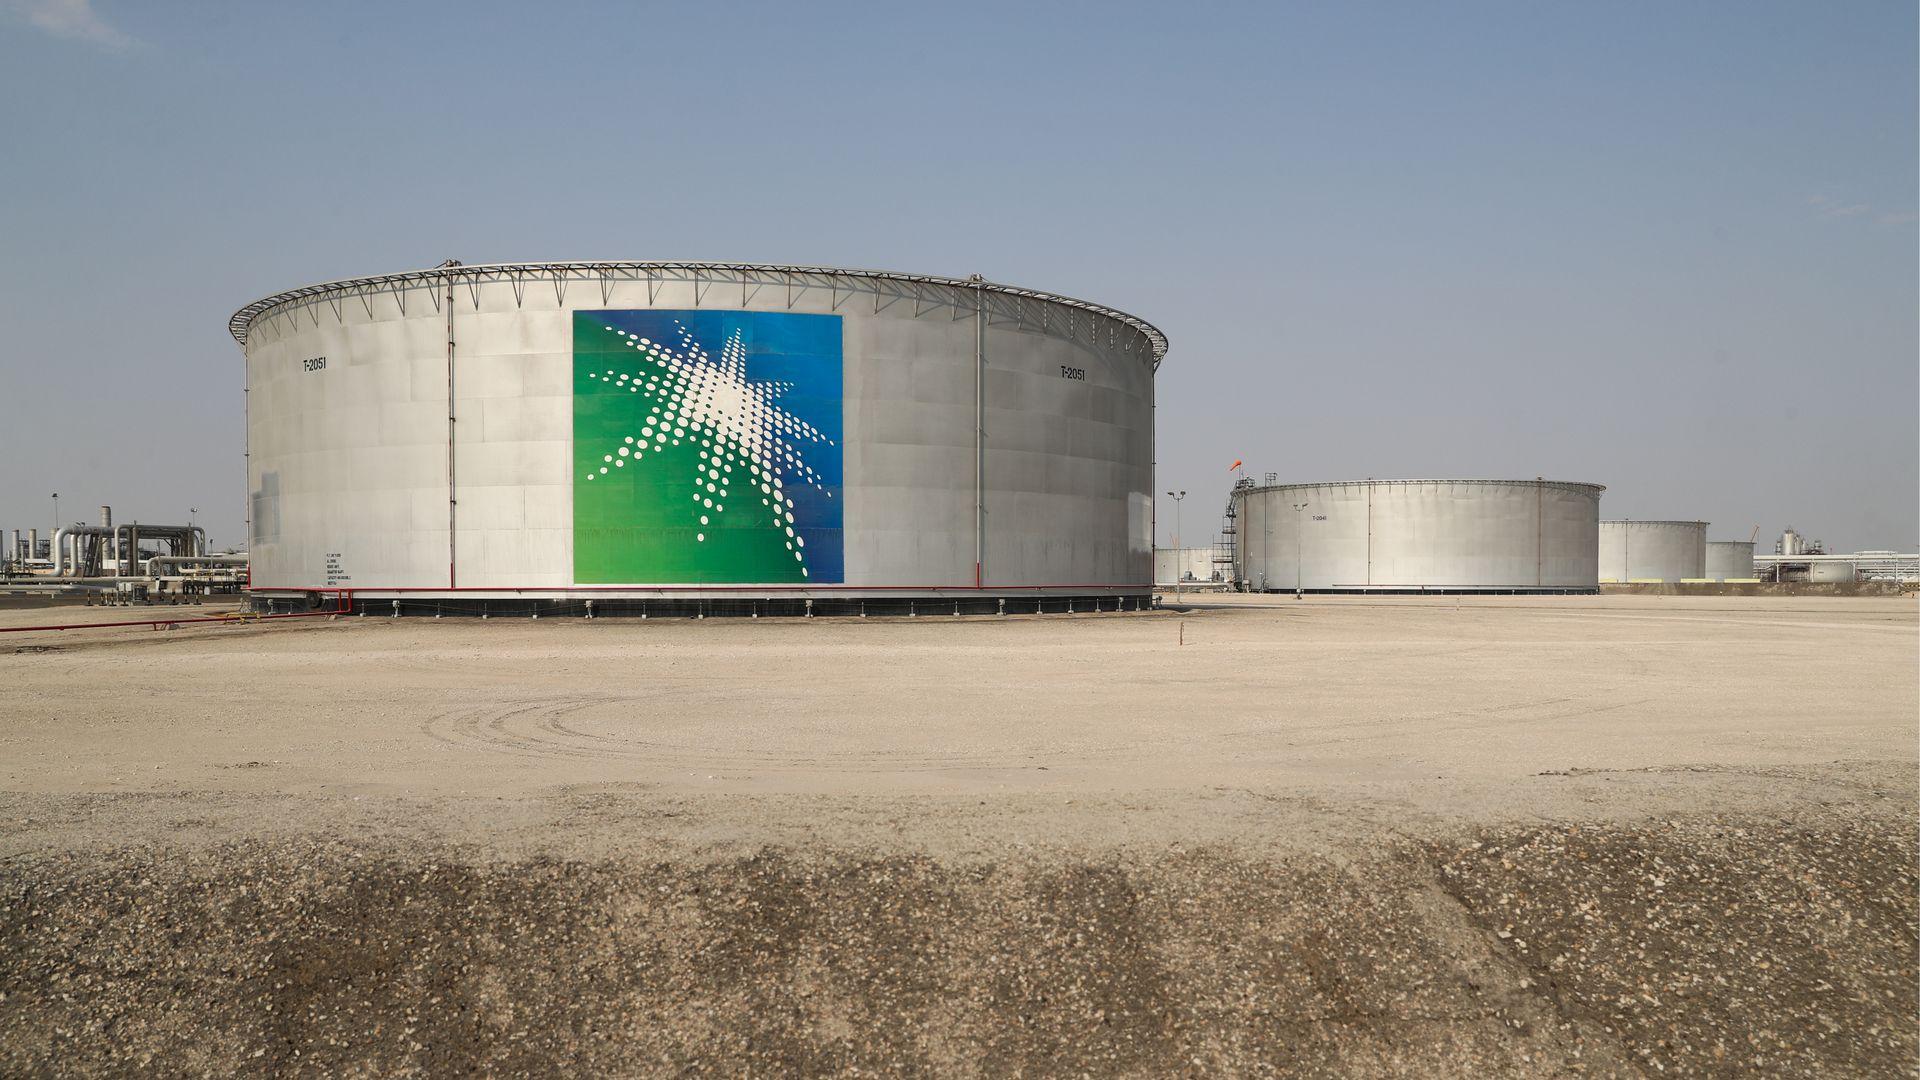 Oil tanks at an oil processing facility of Saudi Aramco